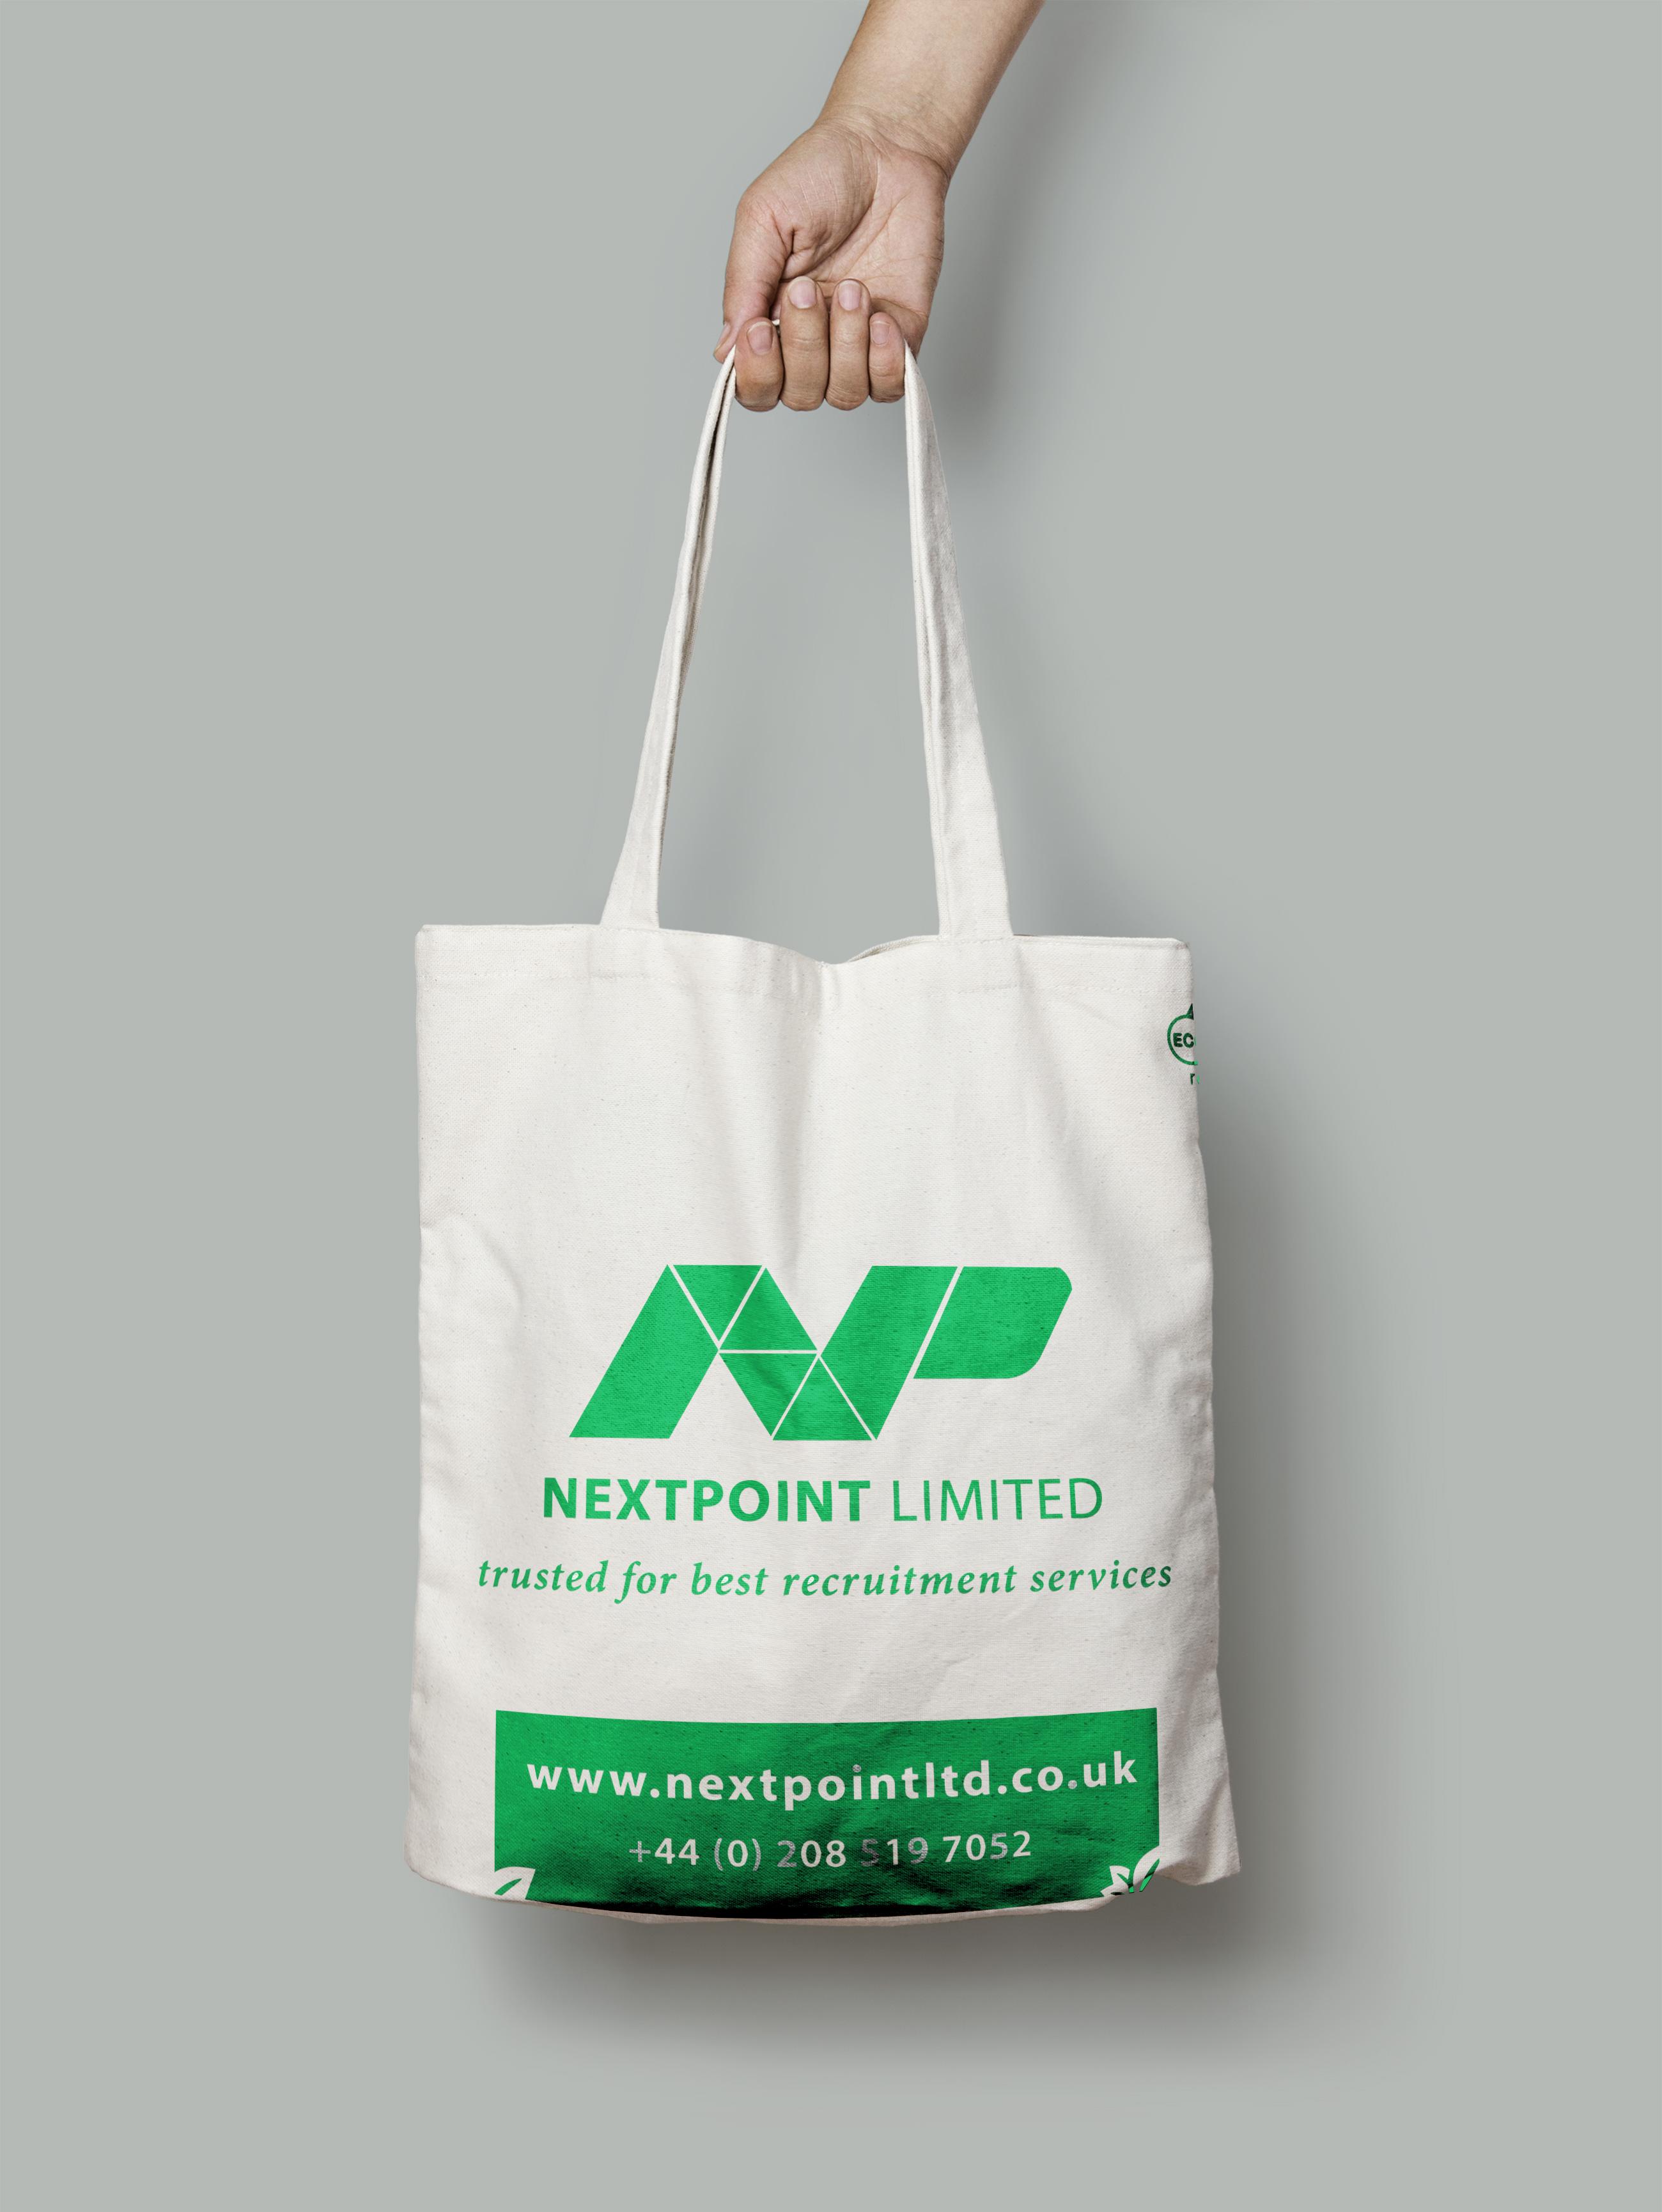 Nextpoint-Tote-Bag-2